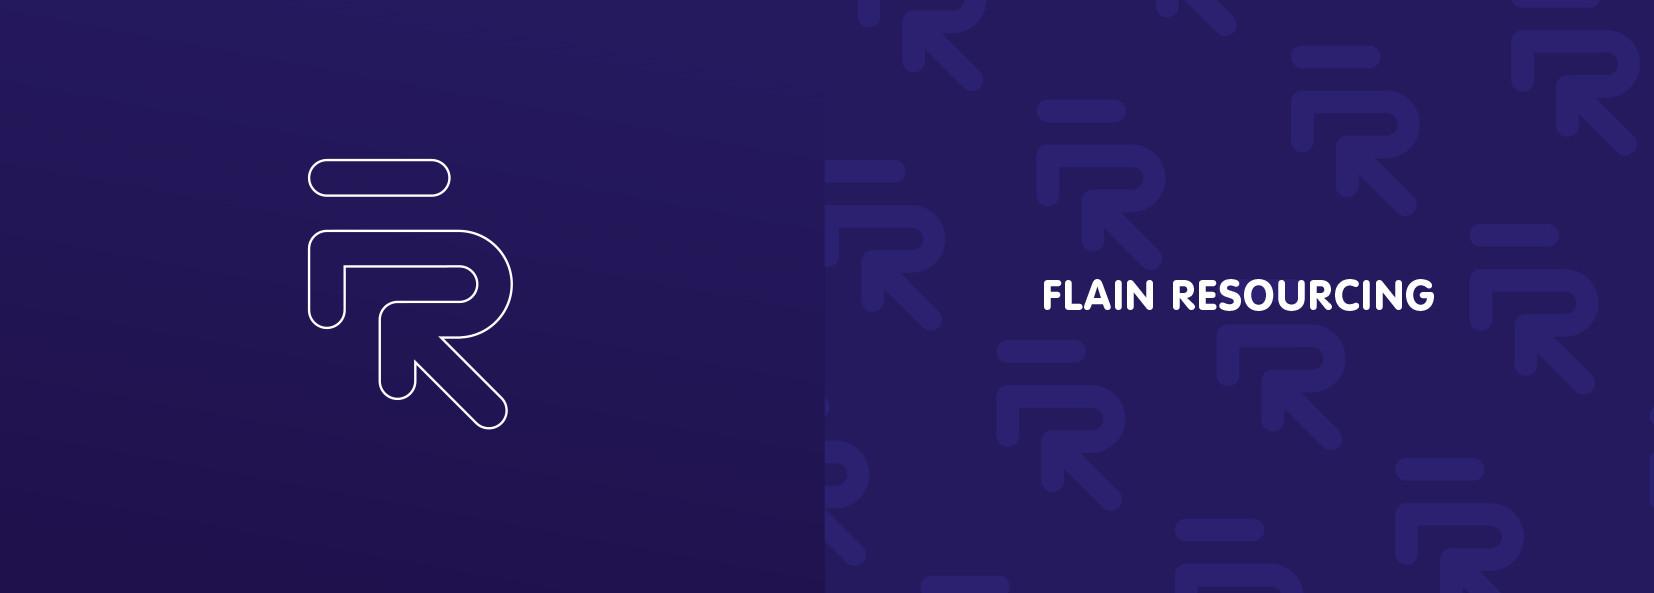 Flain Brand Identity Work 1.jpg